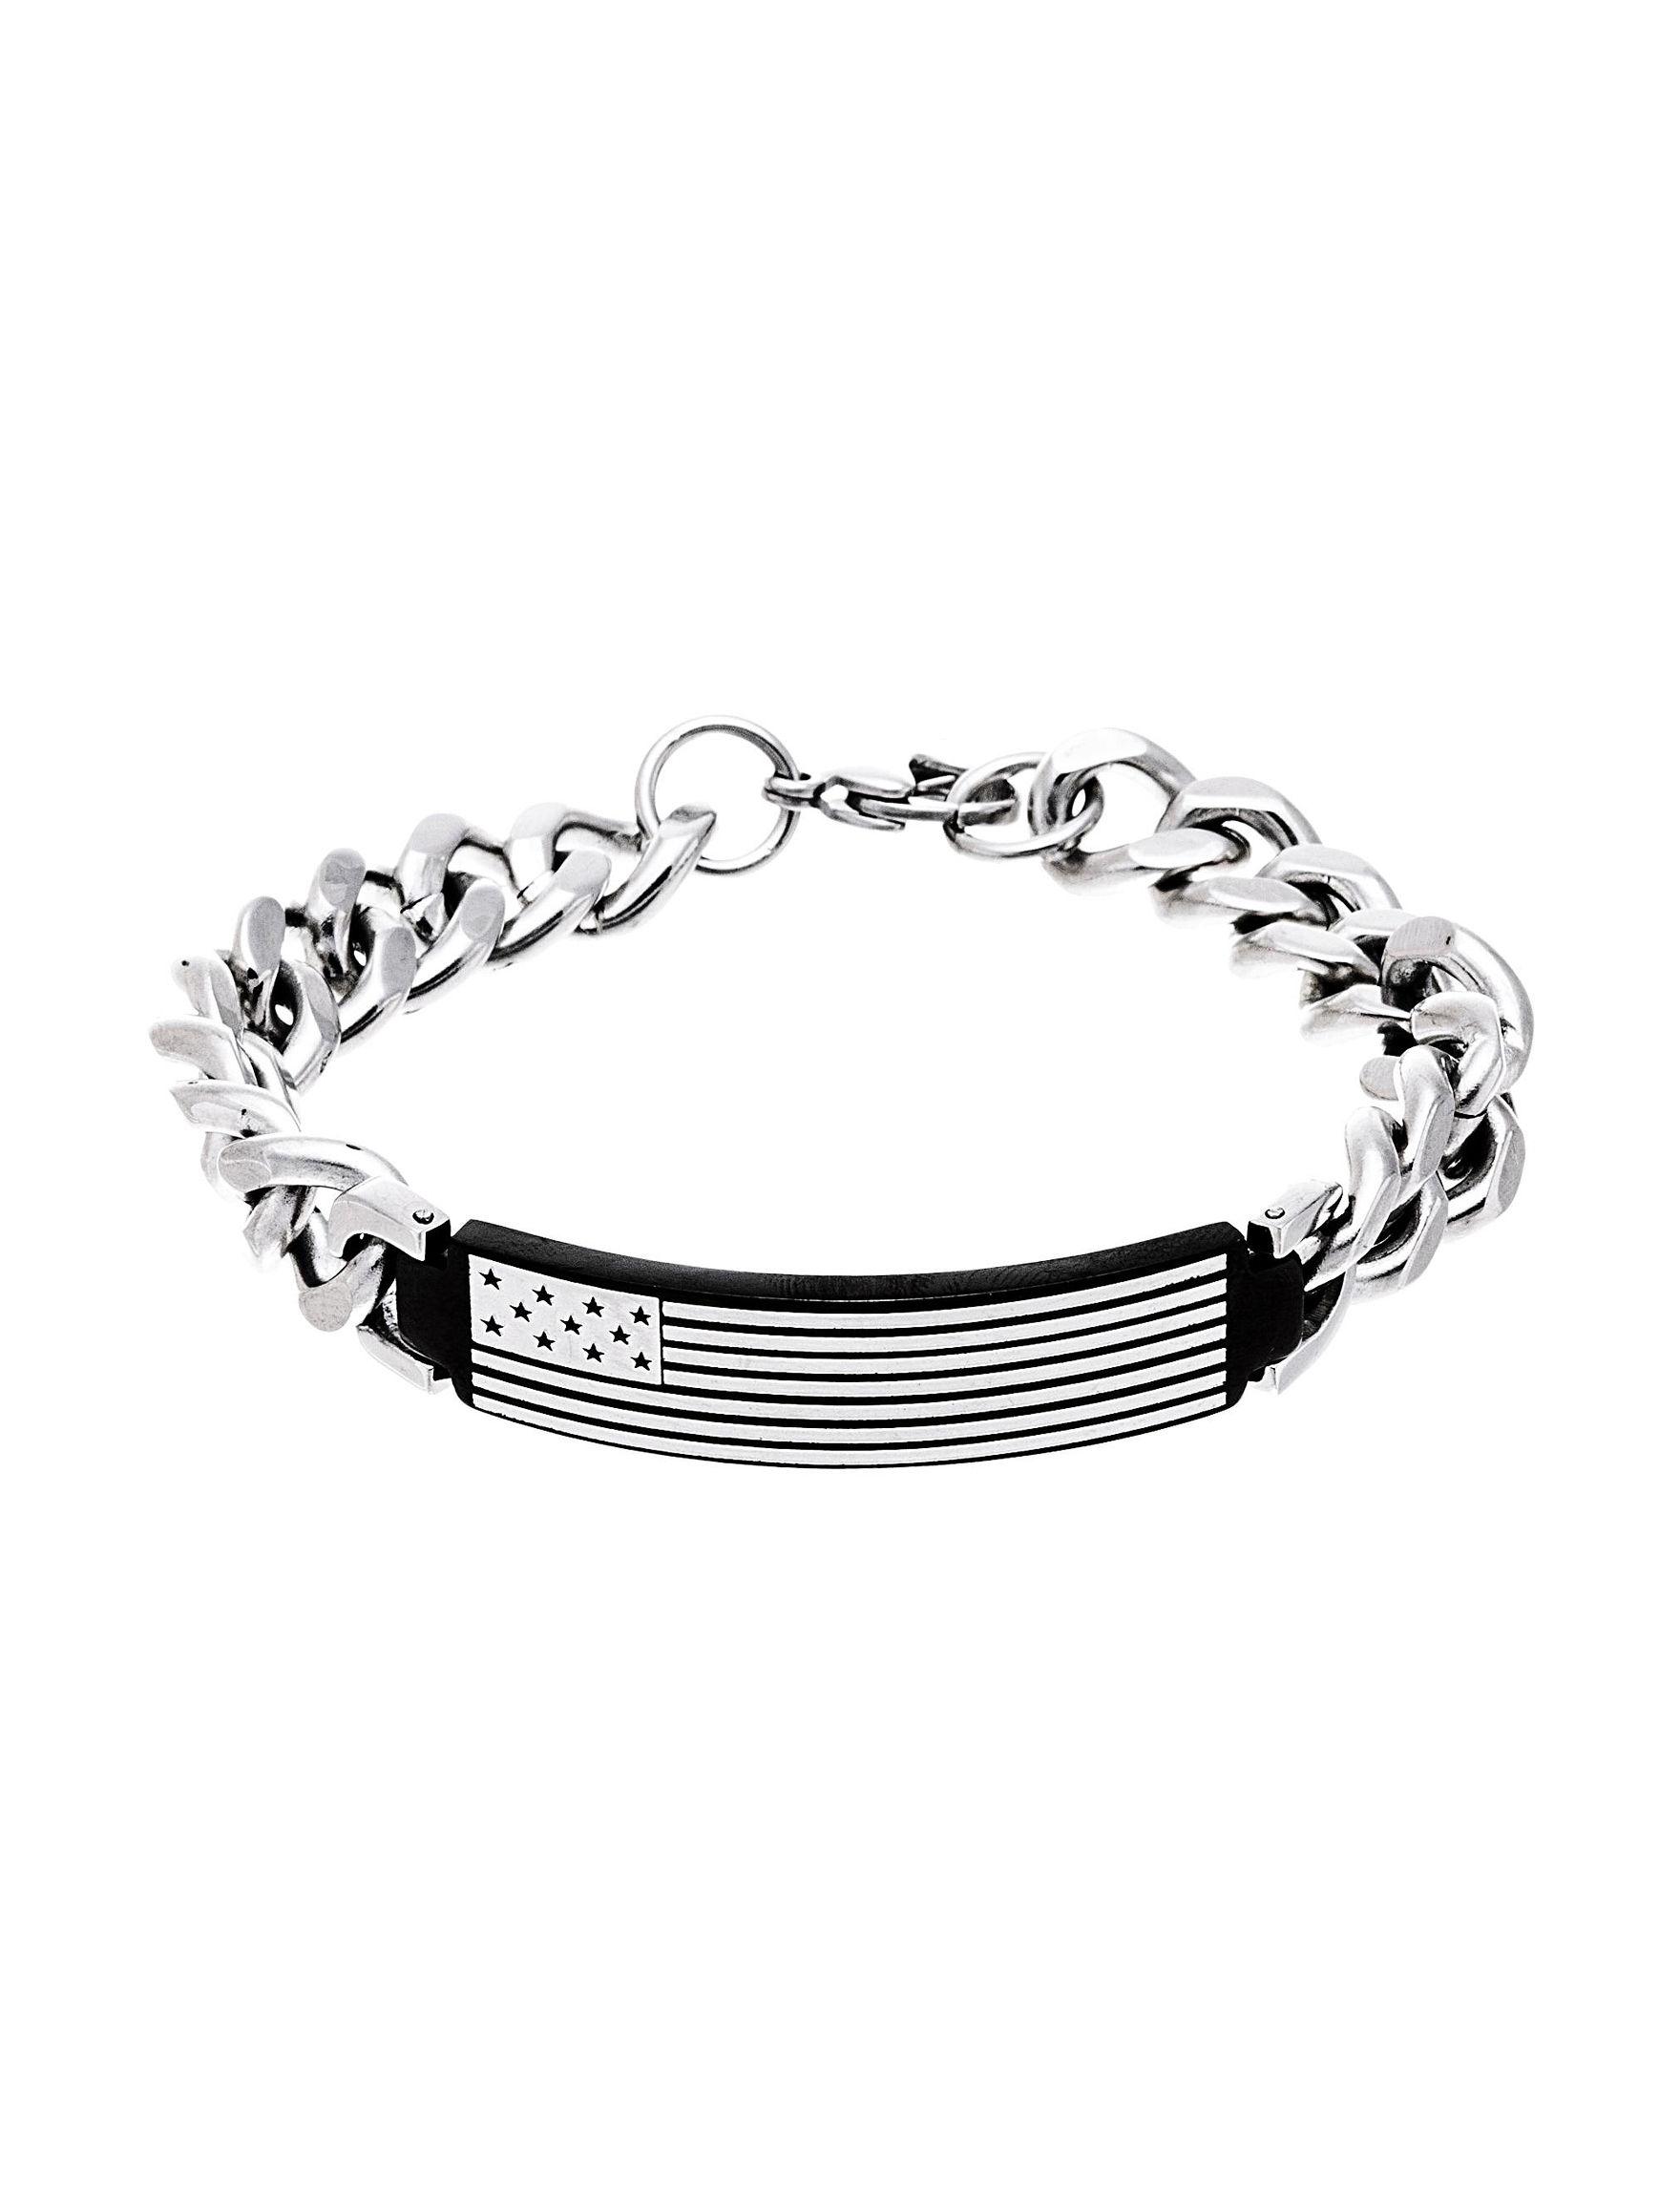 NES Stainless Steel Bracelets Fine Jewelry